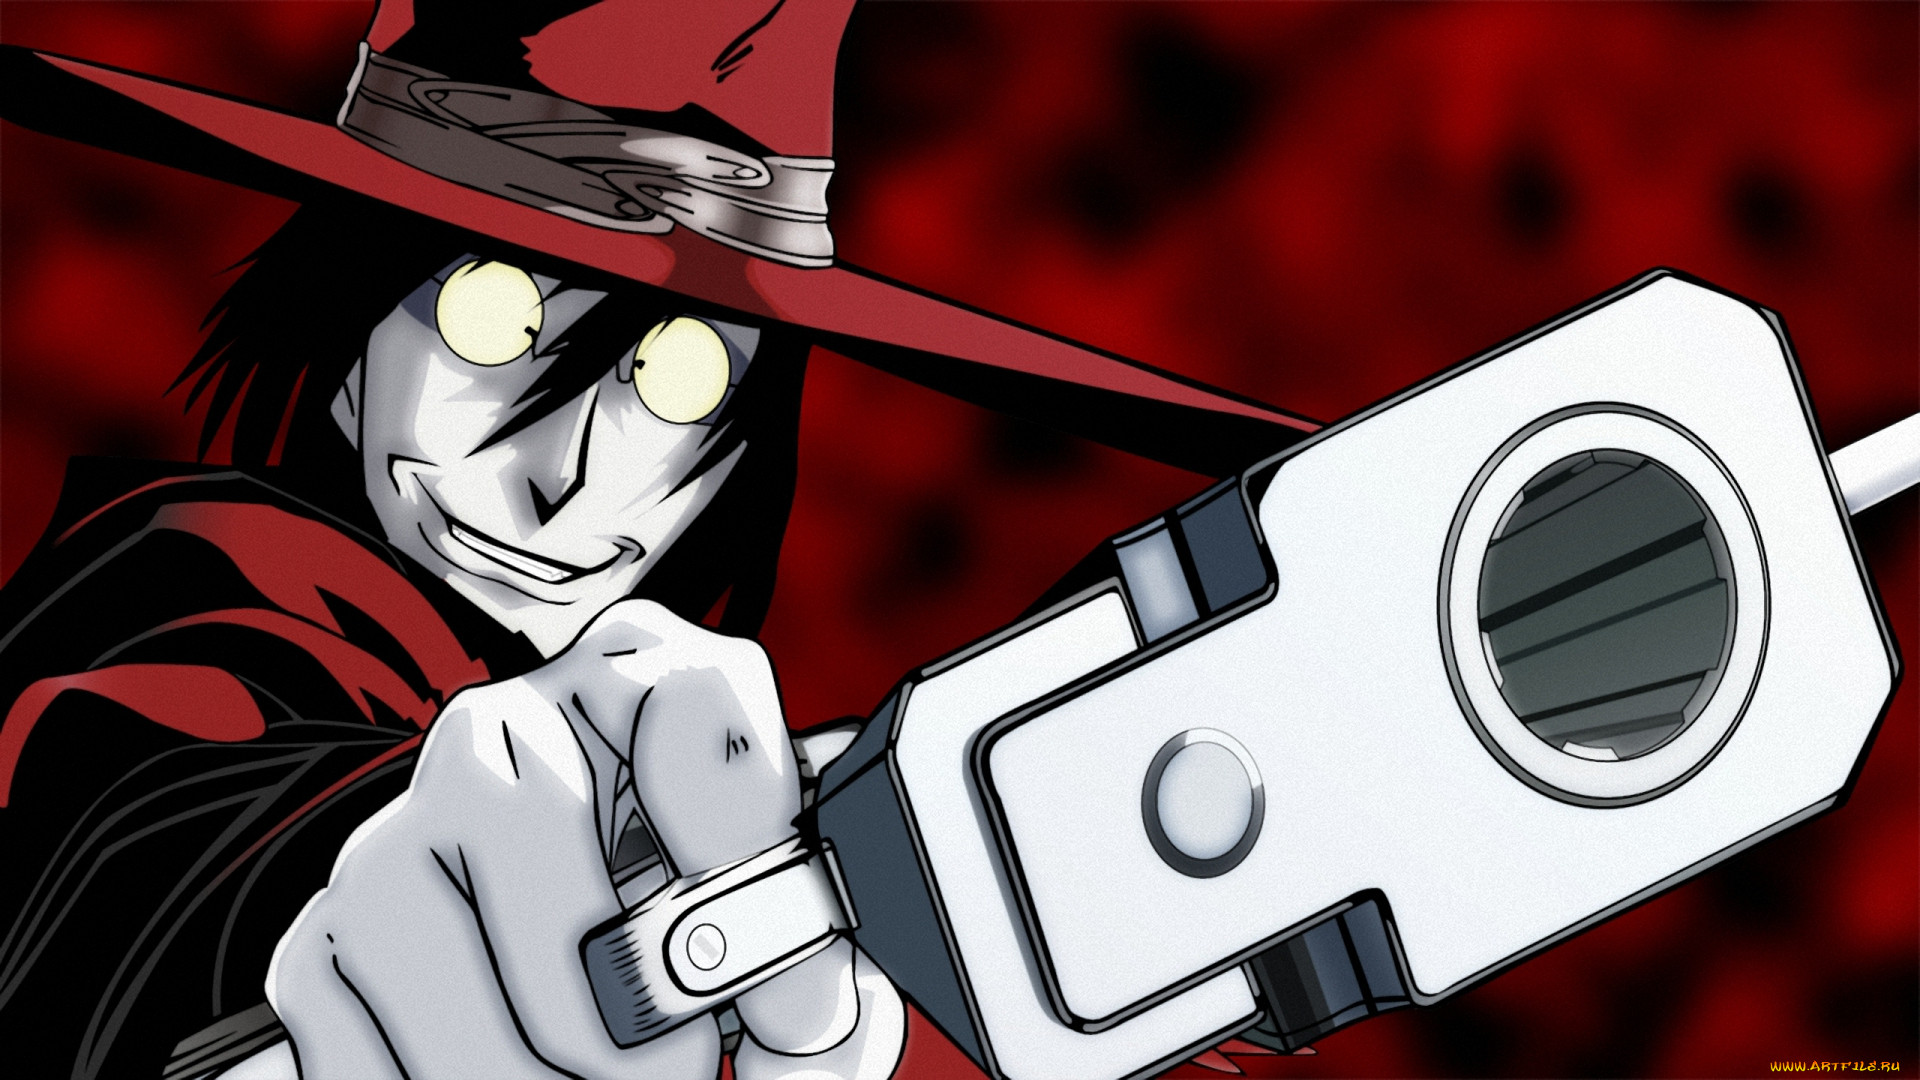 аниме, hellsing, вампир, dracula, шакал, оружие, дракула, алукард, vampire, alucard